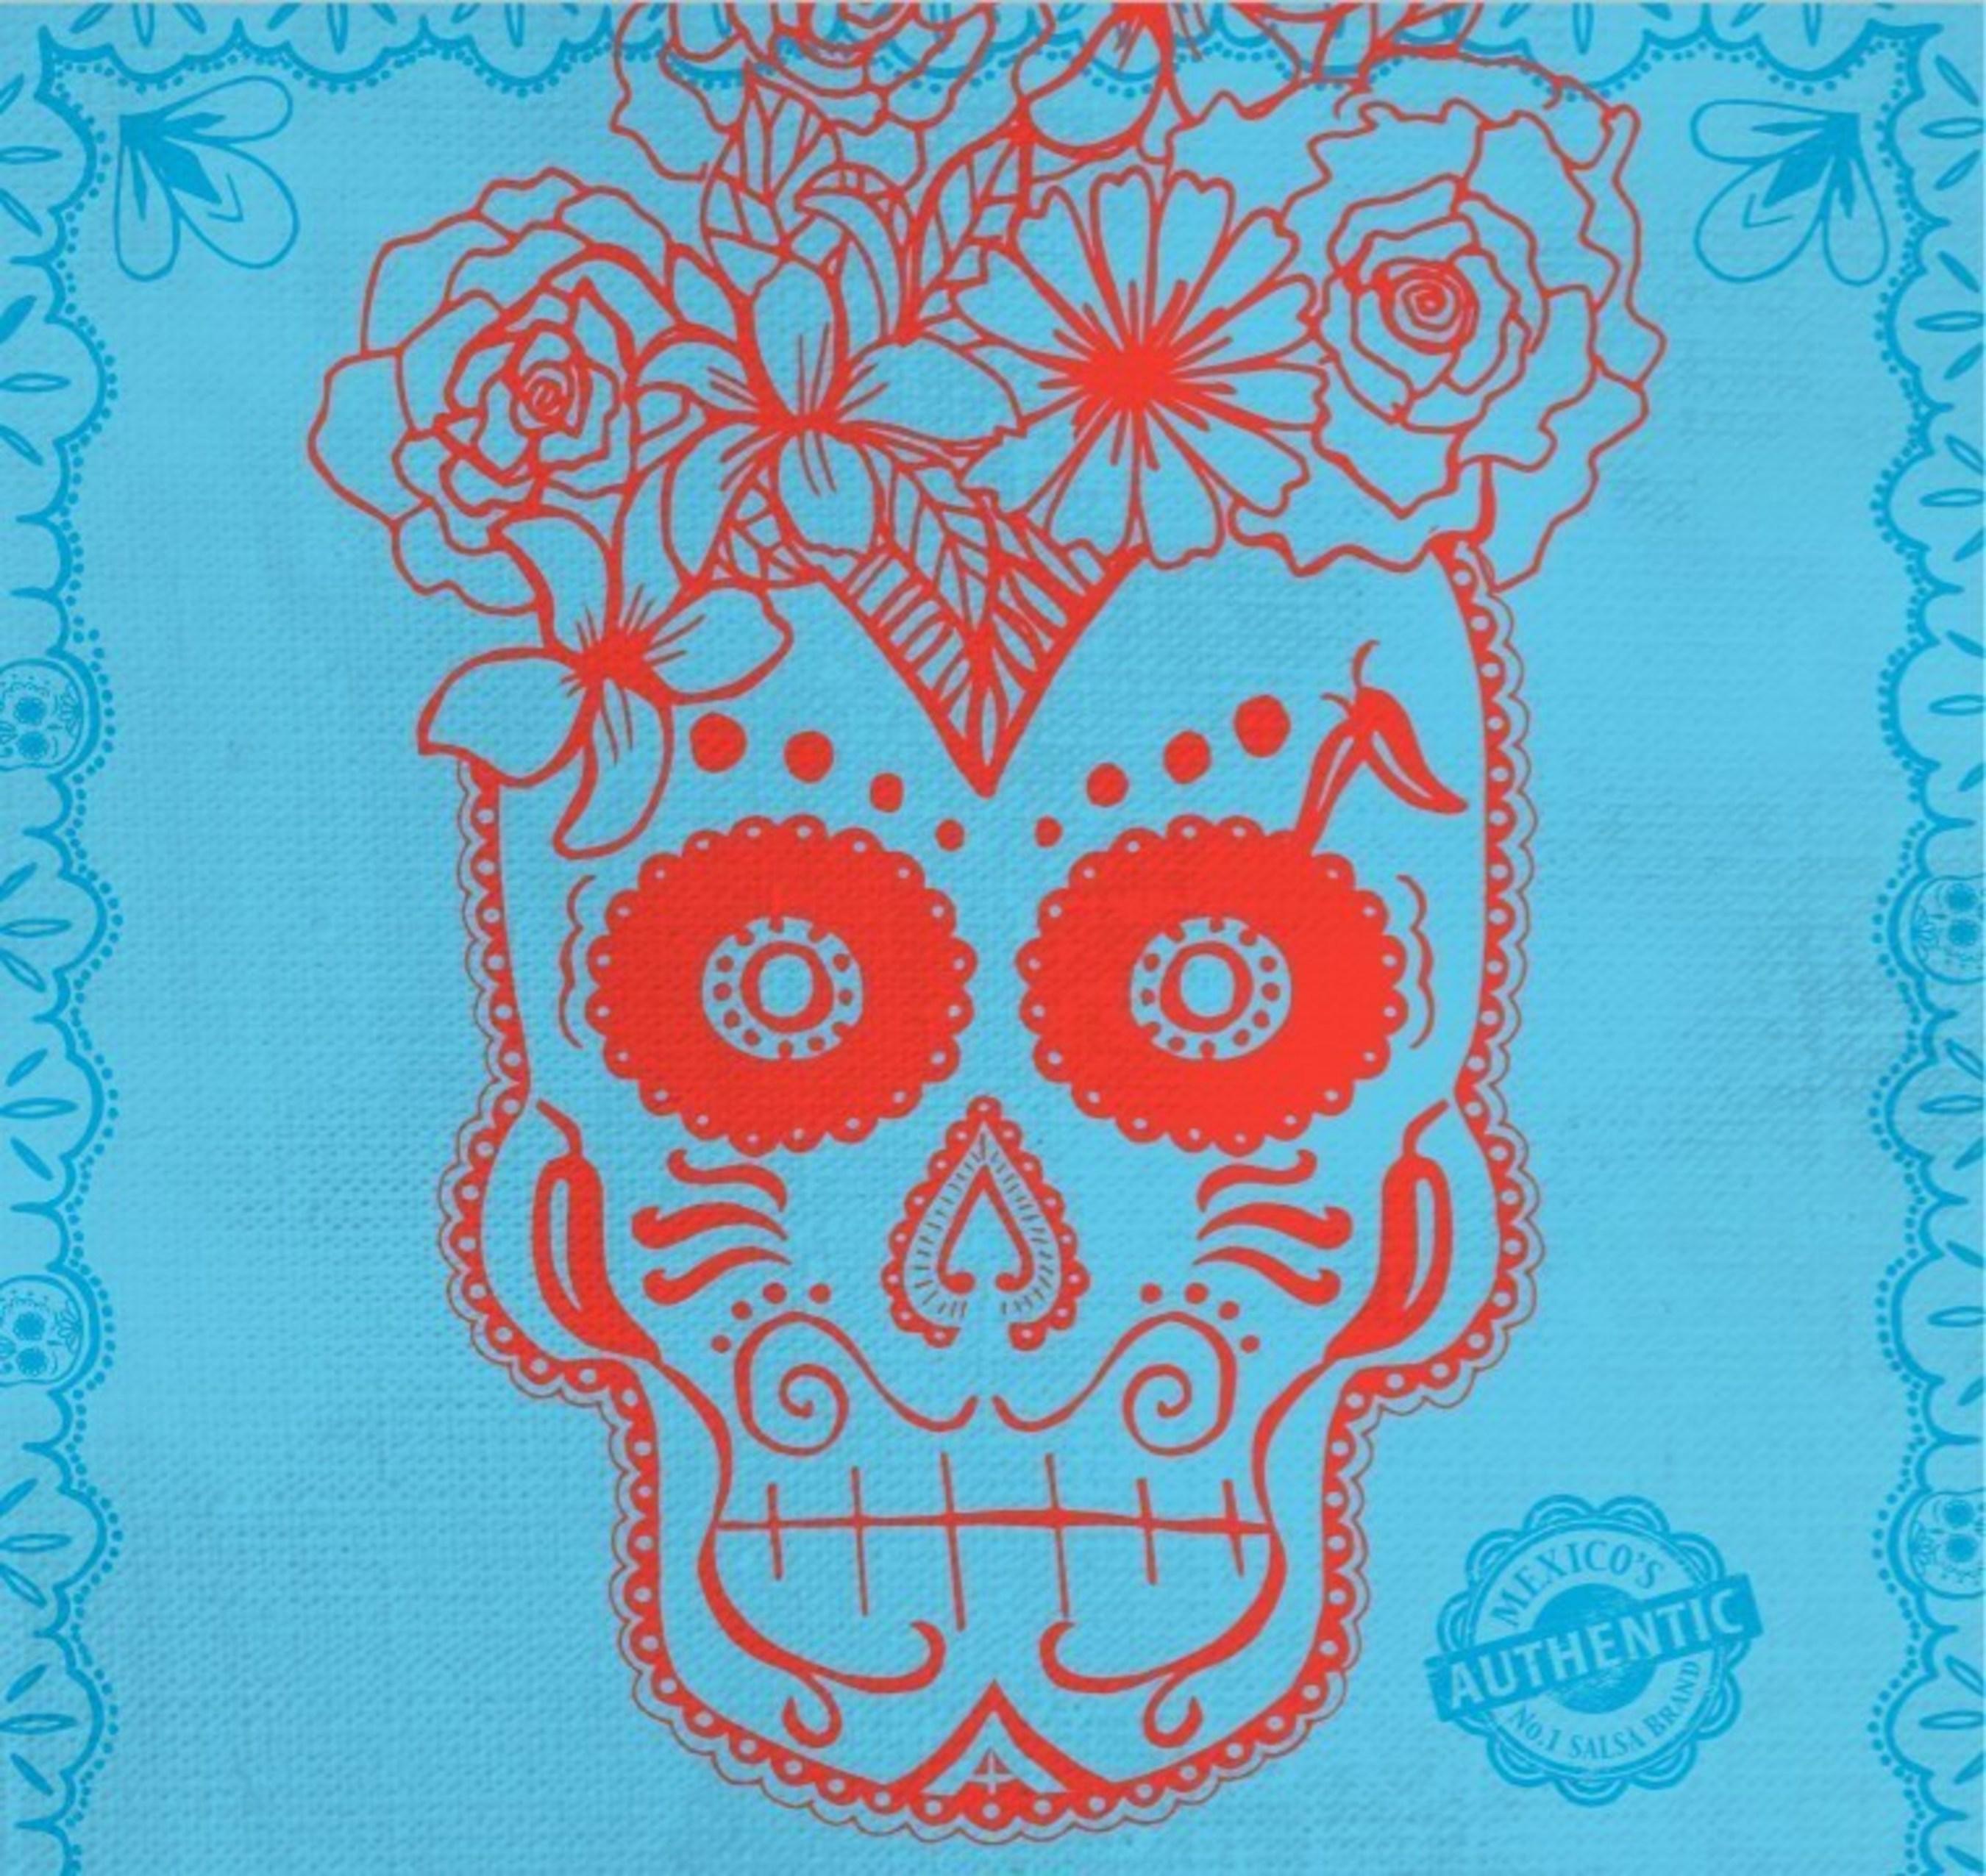 HERDEZ' Brand Celebrates Dia de los Muertos Festivities with MOLAA and NMMA